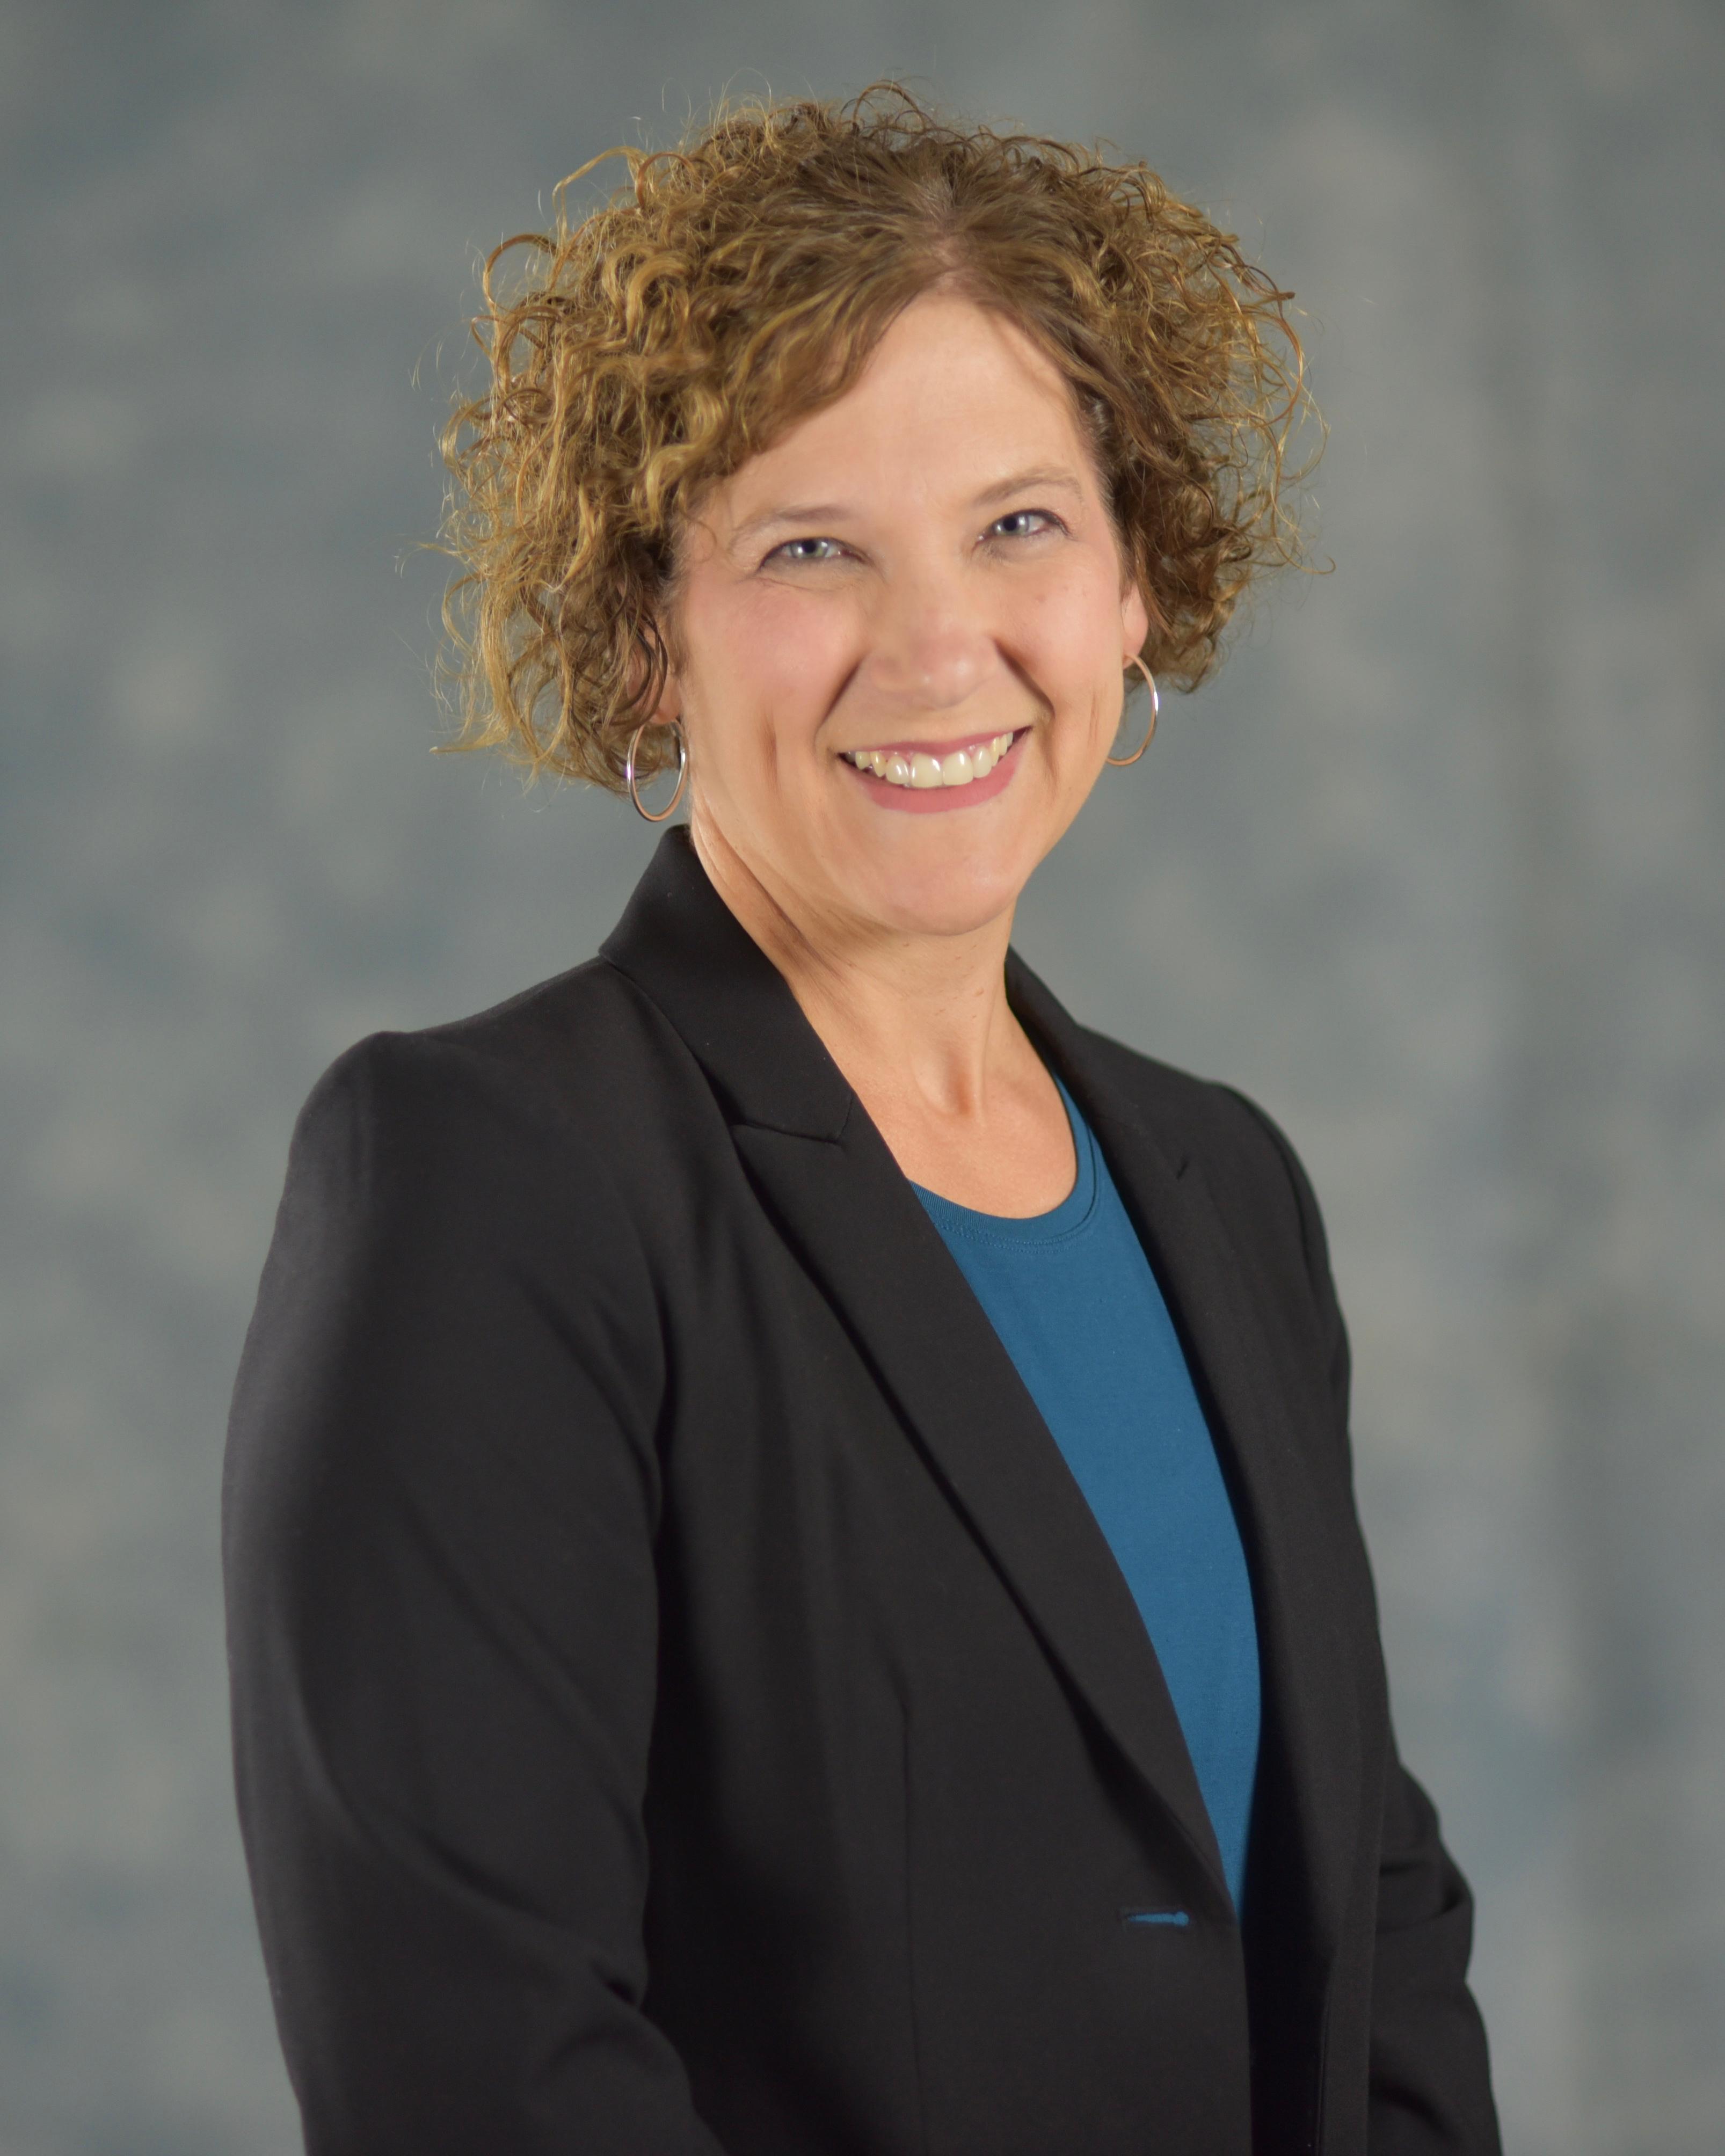 Tina Udell